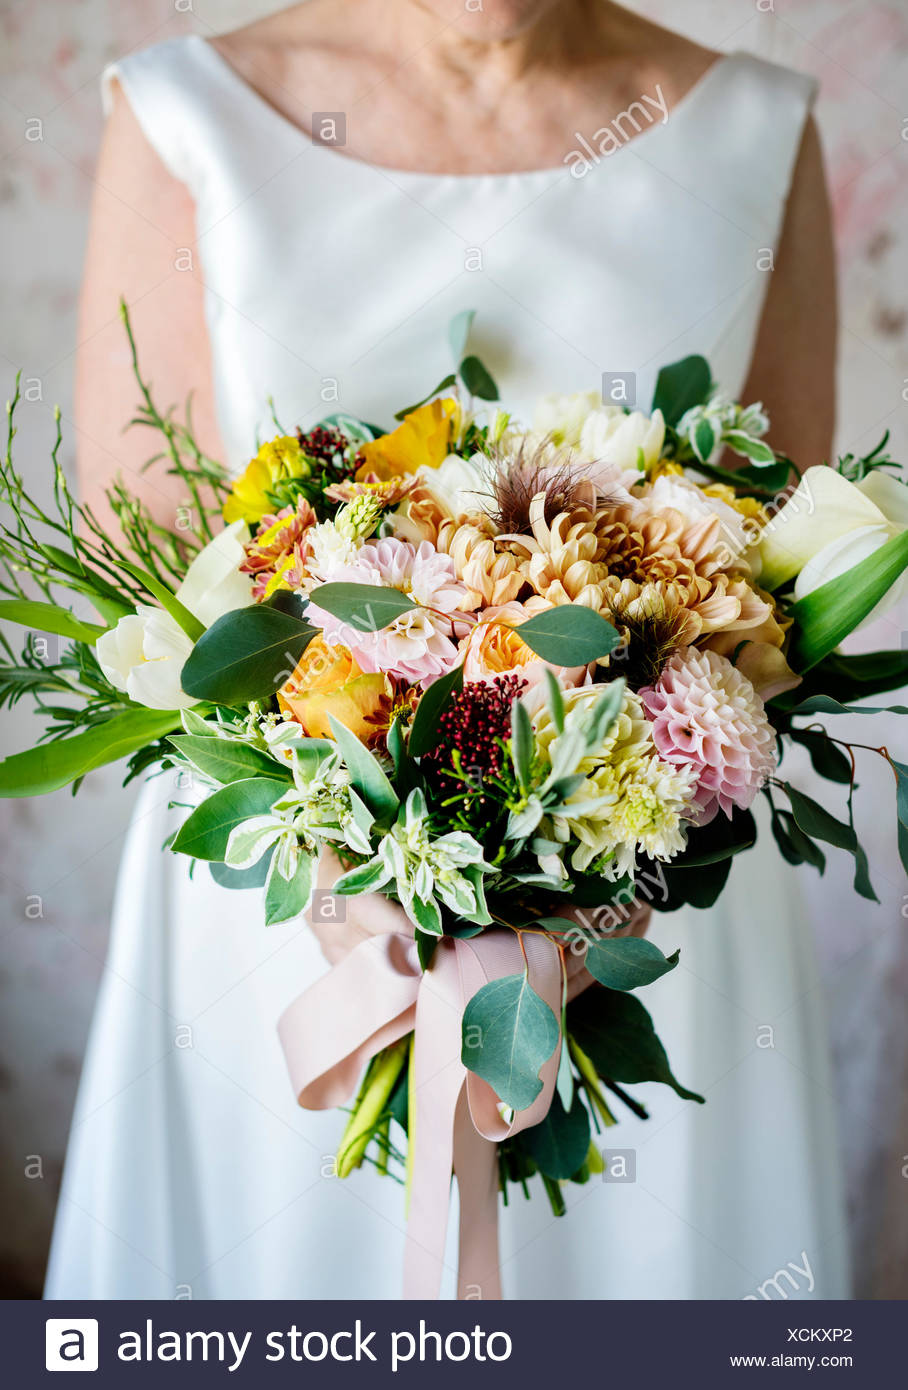 Bride Holding Flower Bouquet Wedding Engagement Ceremony Stock Photo